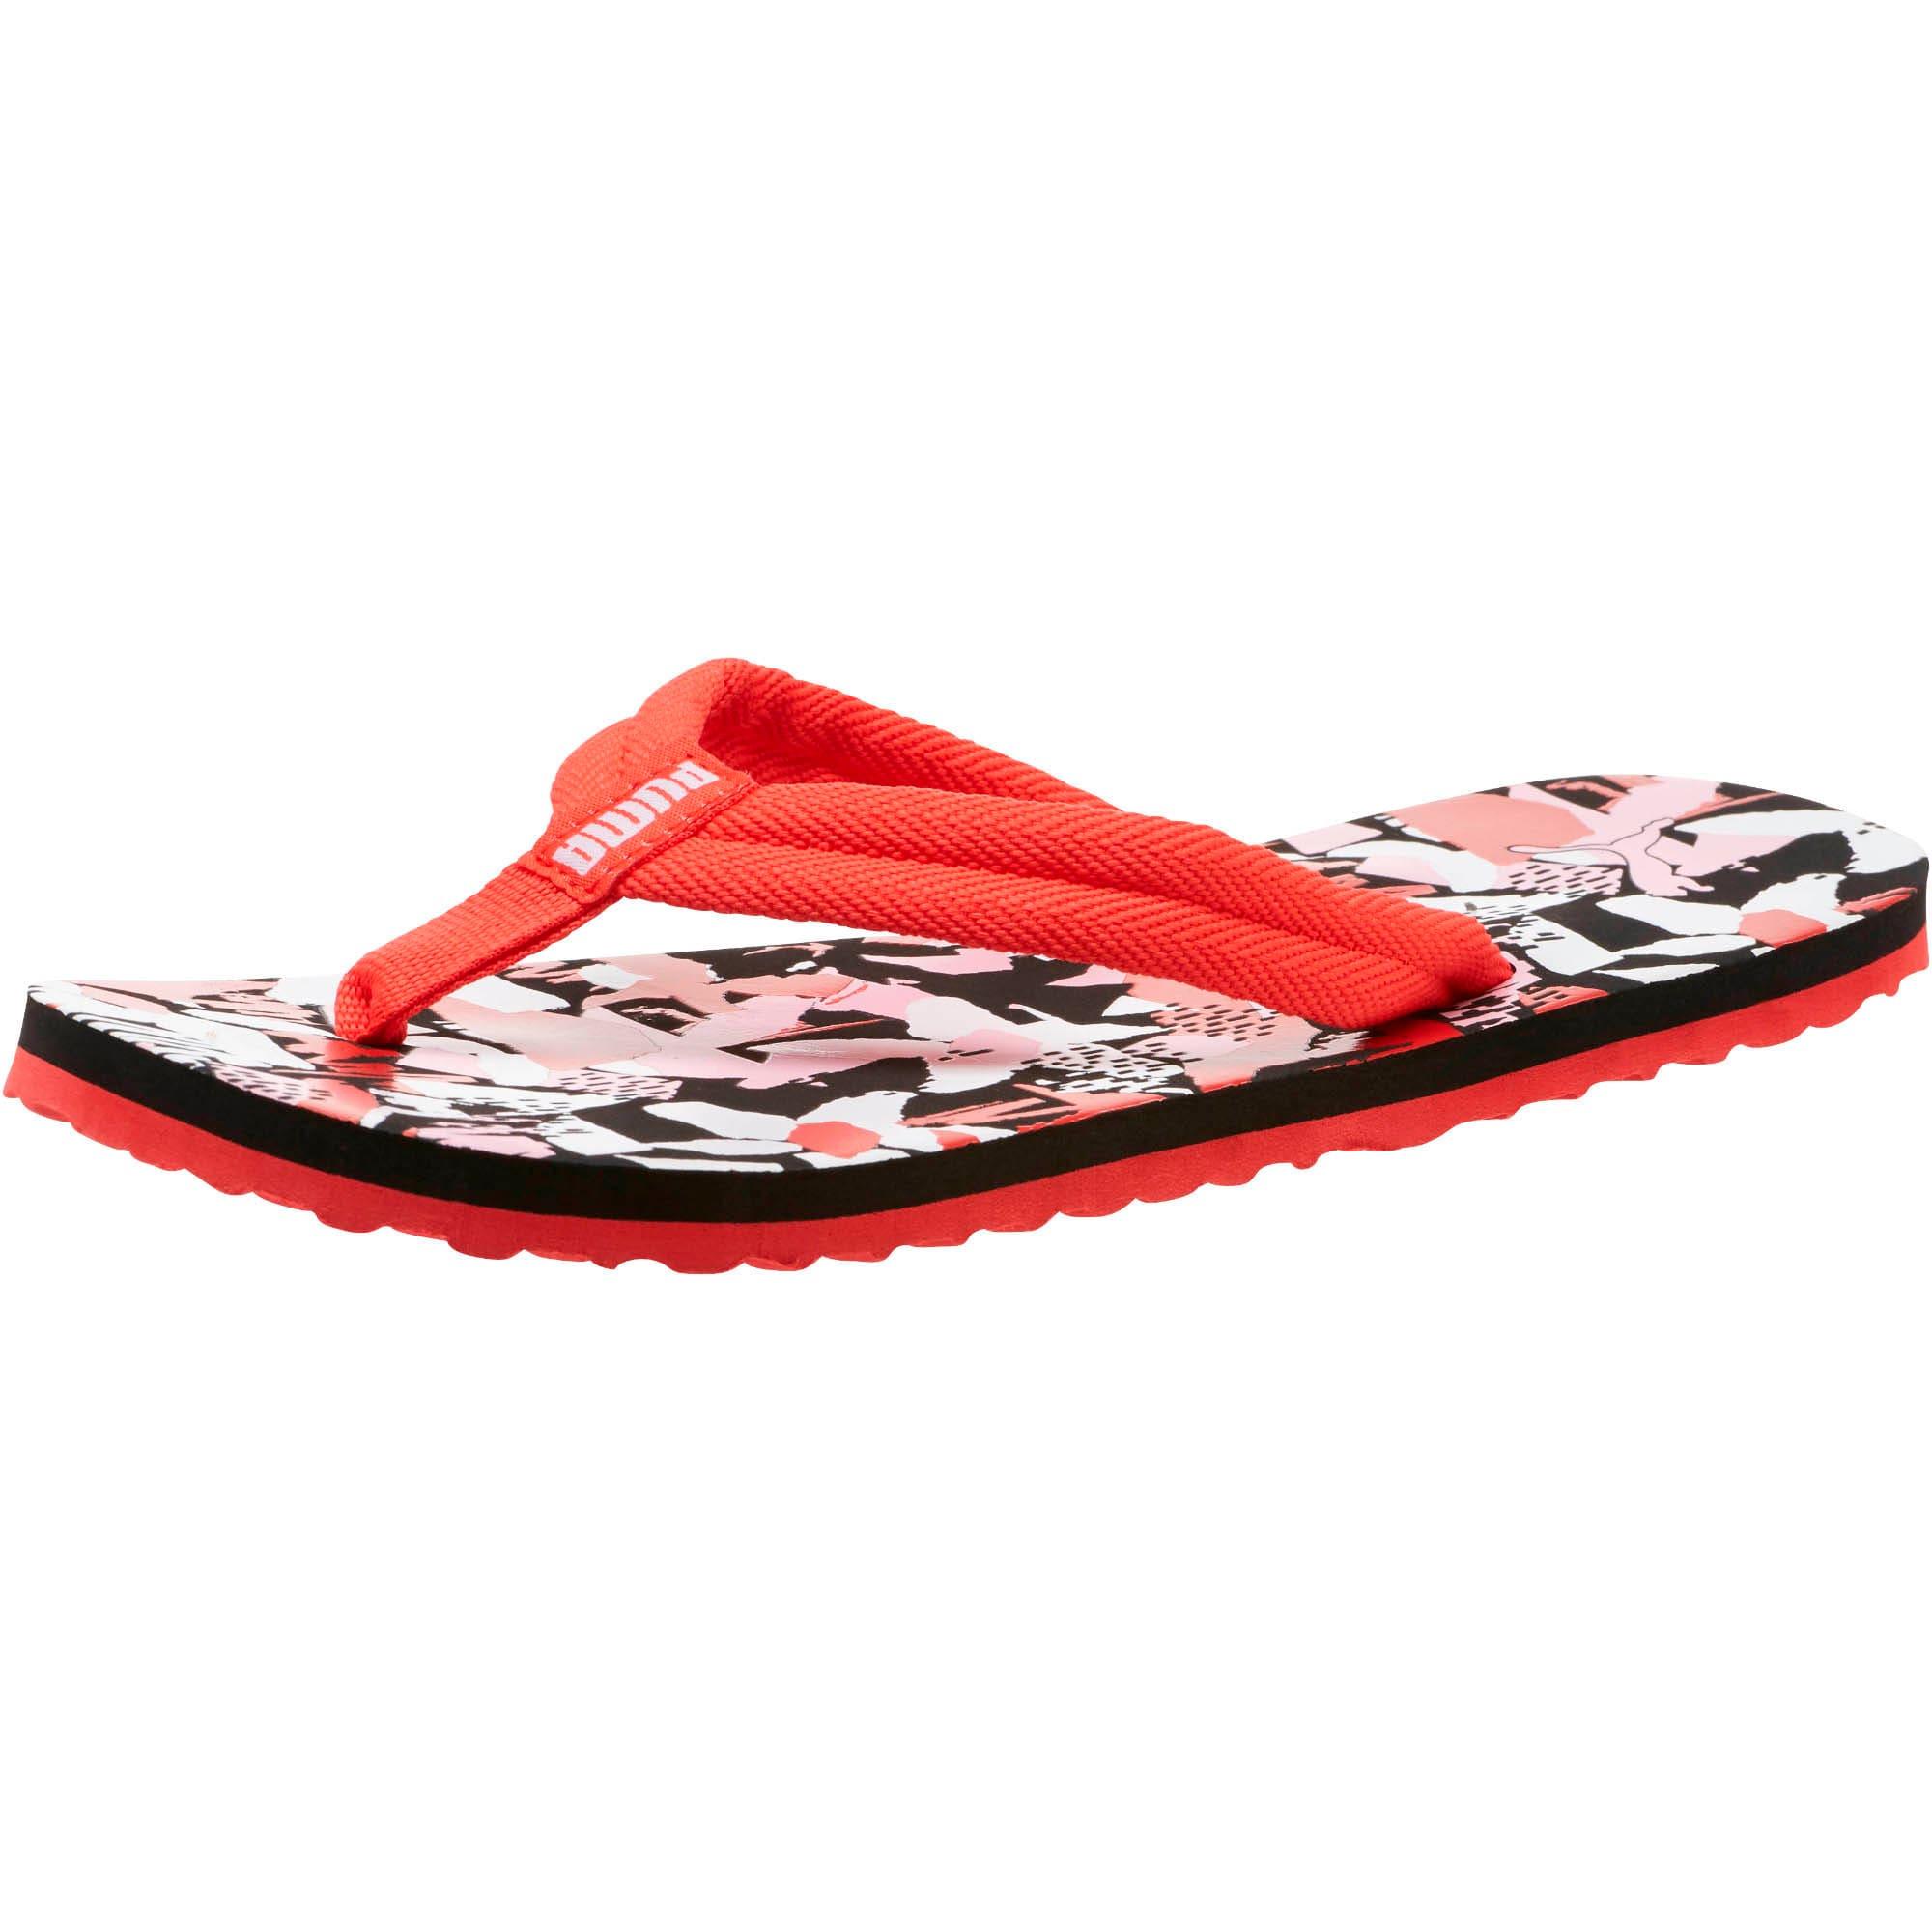 Thumbnail 1 of Epic Flip v2 Floral Women's Sandals, Hibiscus -Pale Pink, medium